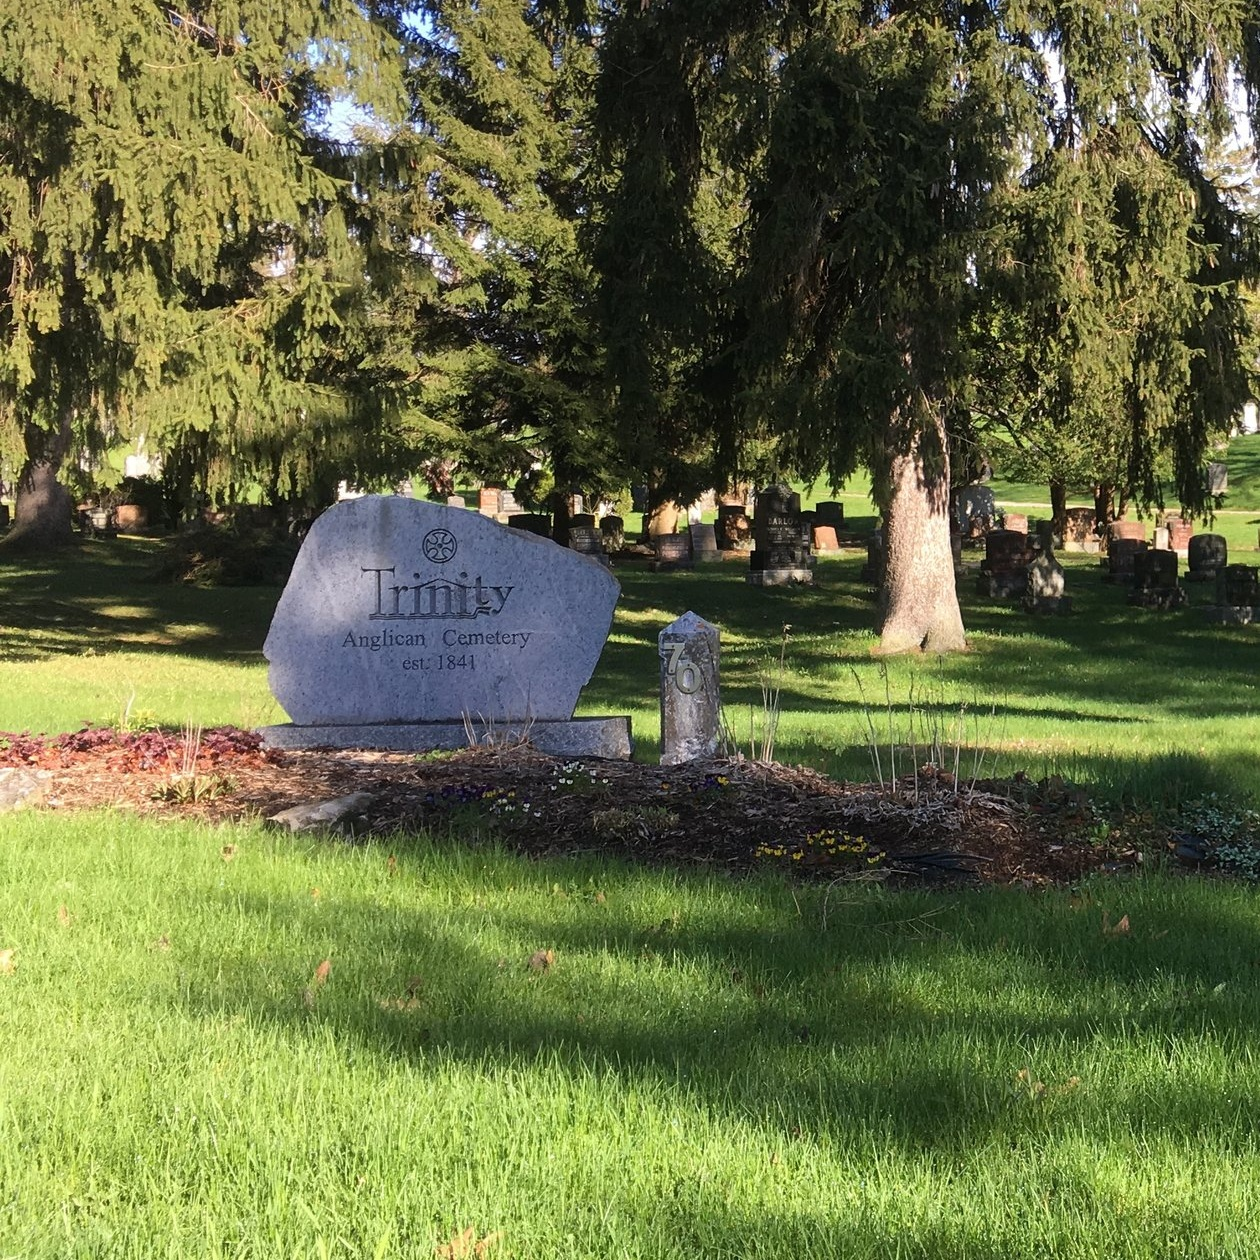 Trinity Anglican Church Cemetery